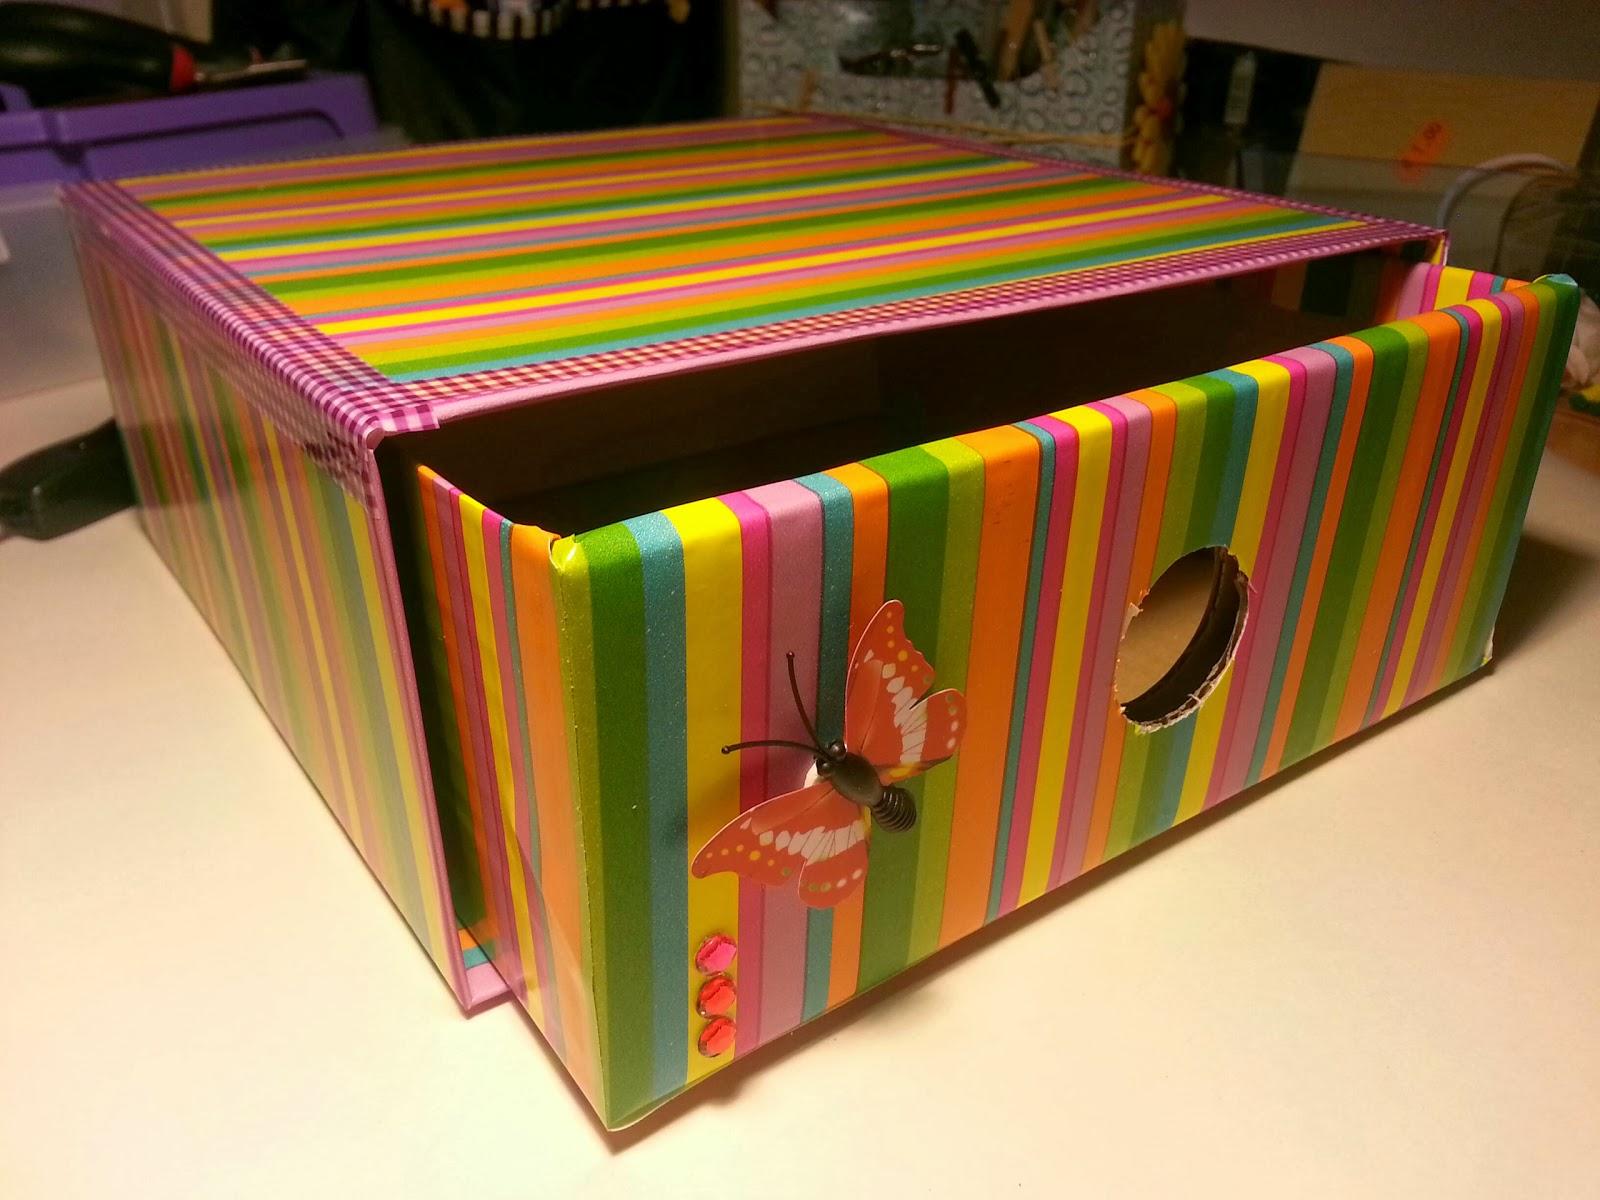 http://manualidadesaalcuadrado.blogspot.com.ar/2013/10/reciclando-caja-de-la-glossybox.html